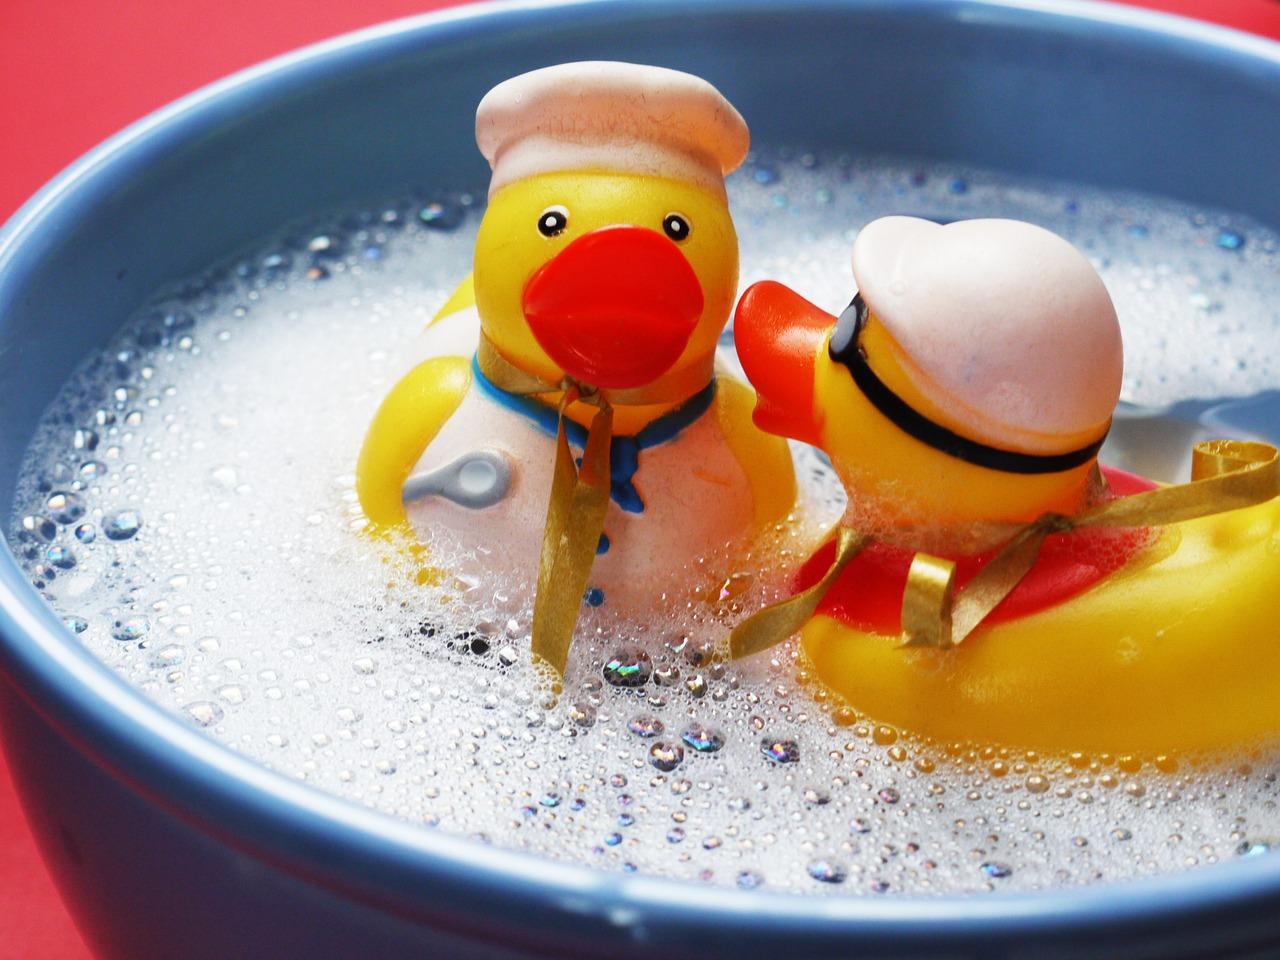 Danke an MonikaP für die Badeenten :-)